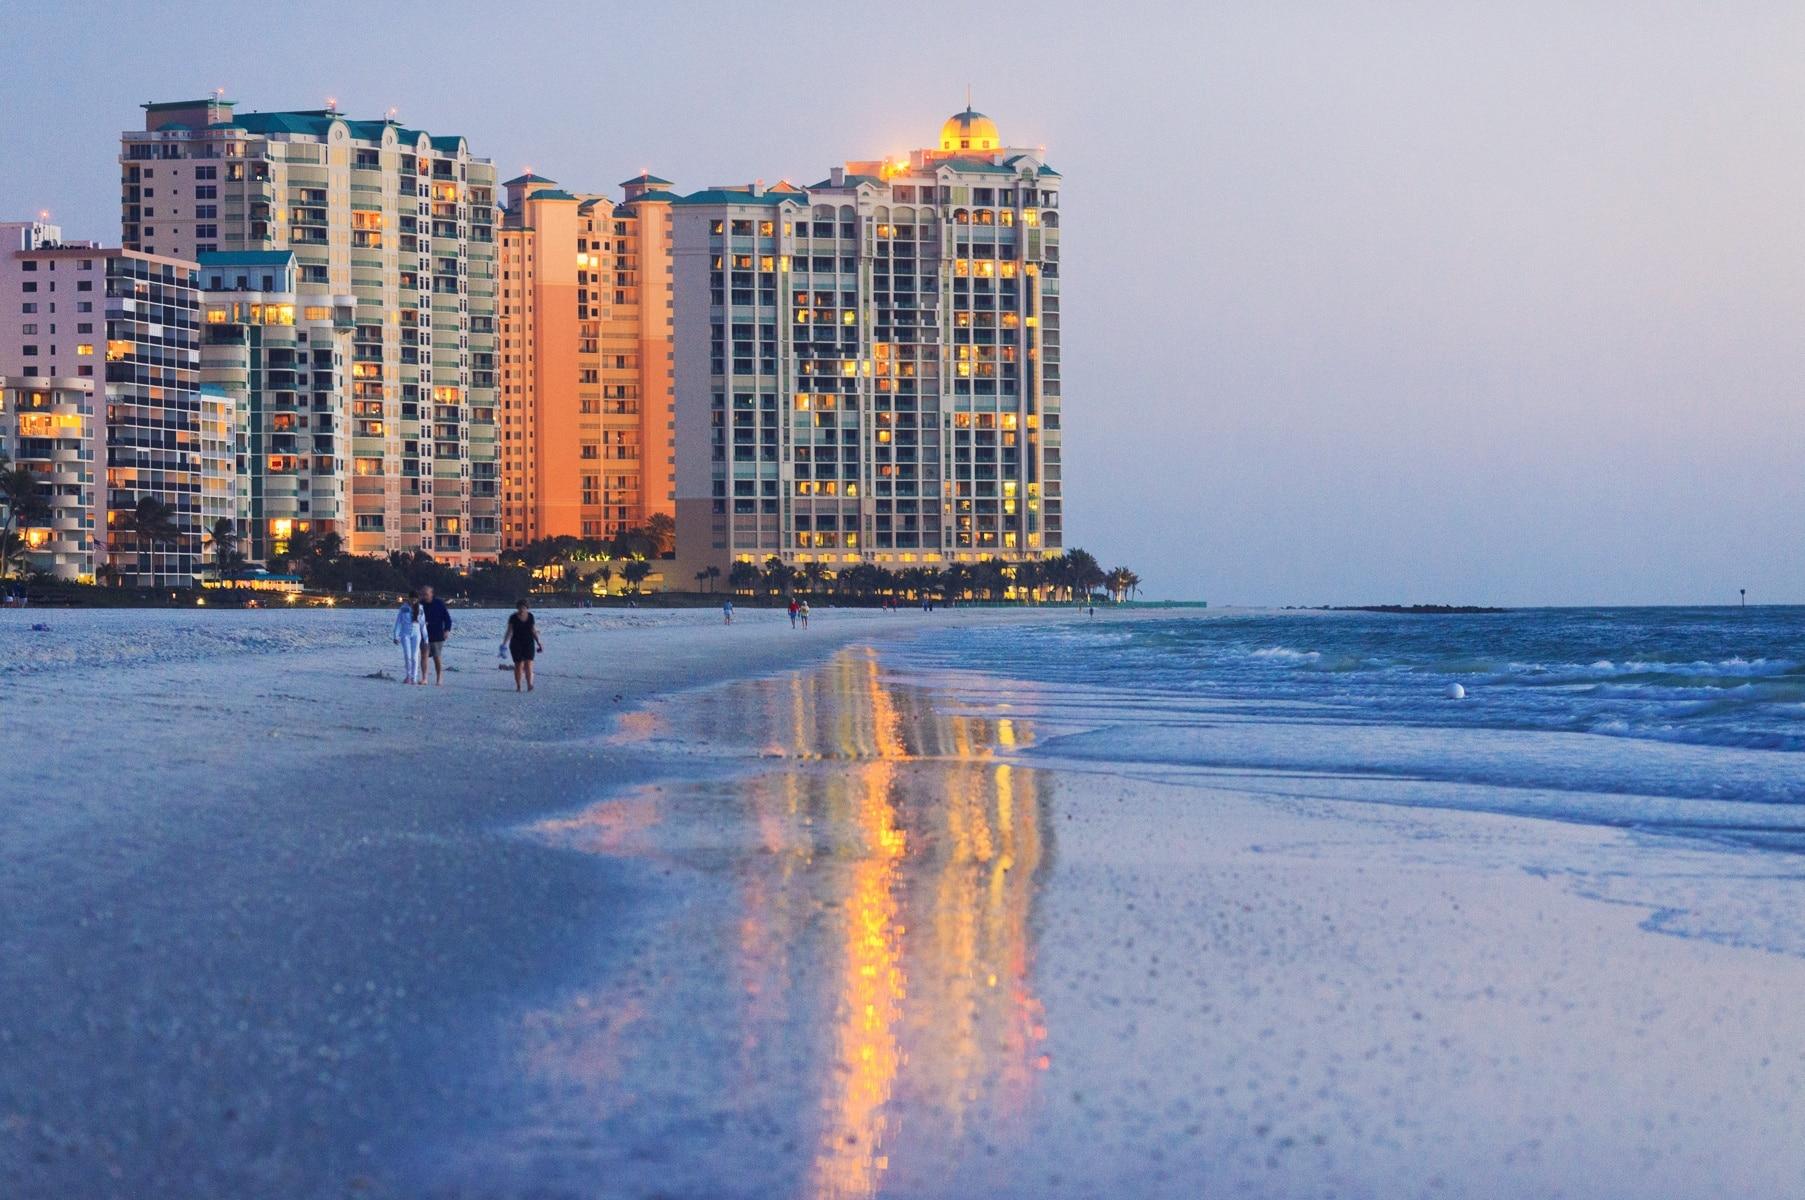 Marco Island, Florida, United States of America